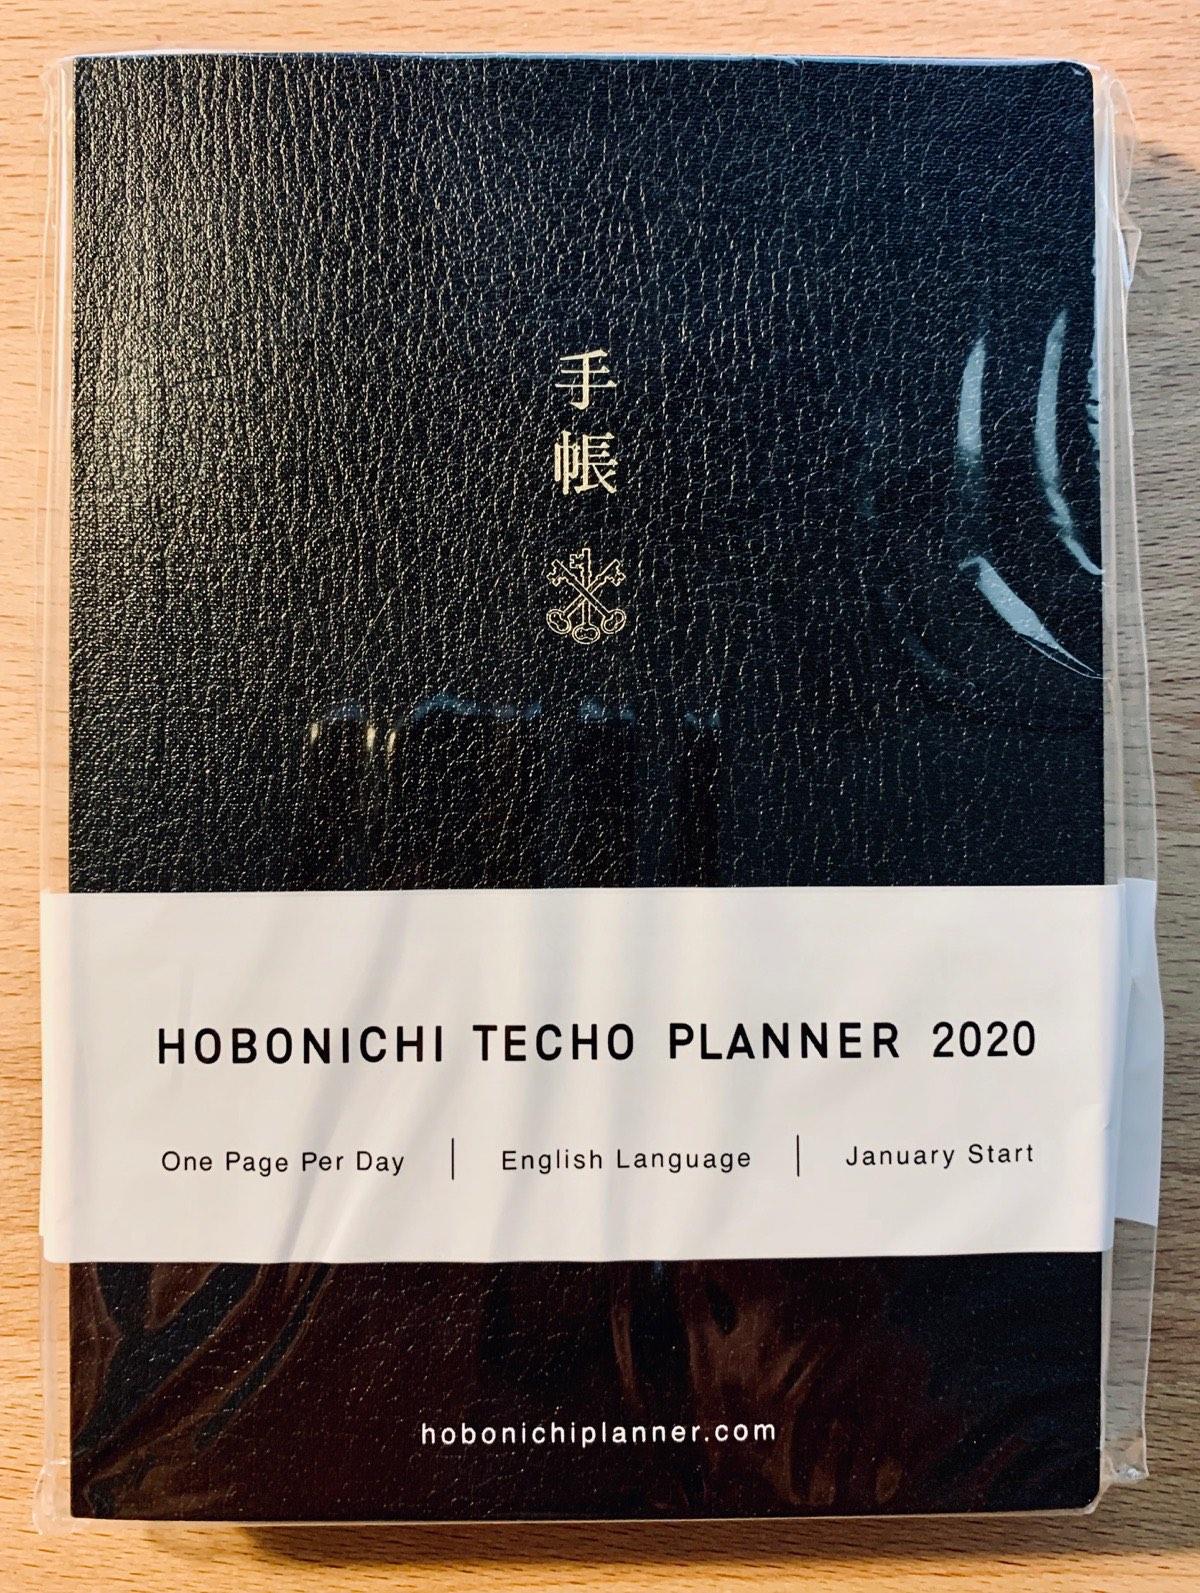 The Hobonichi Techo Planner 2020